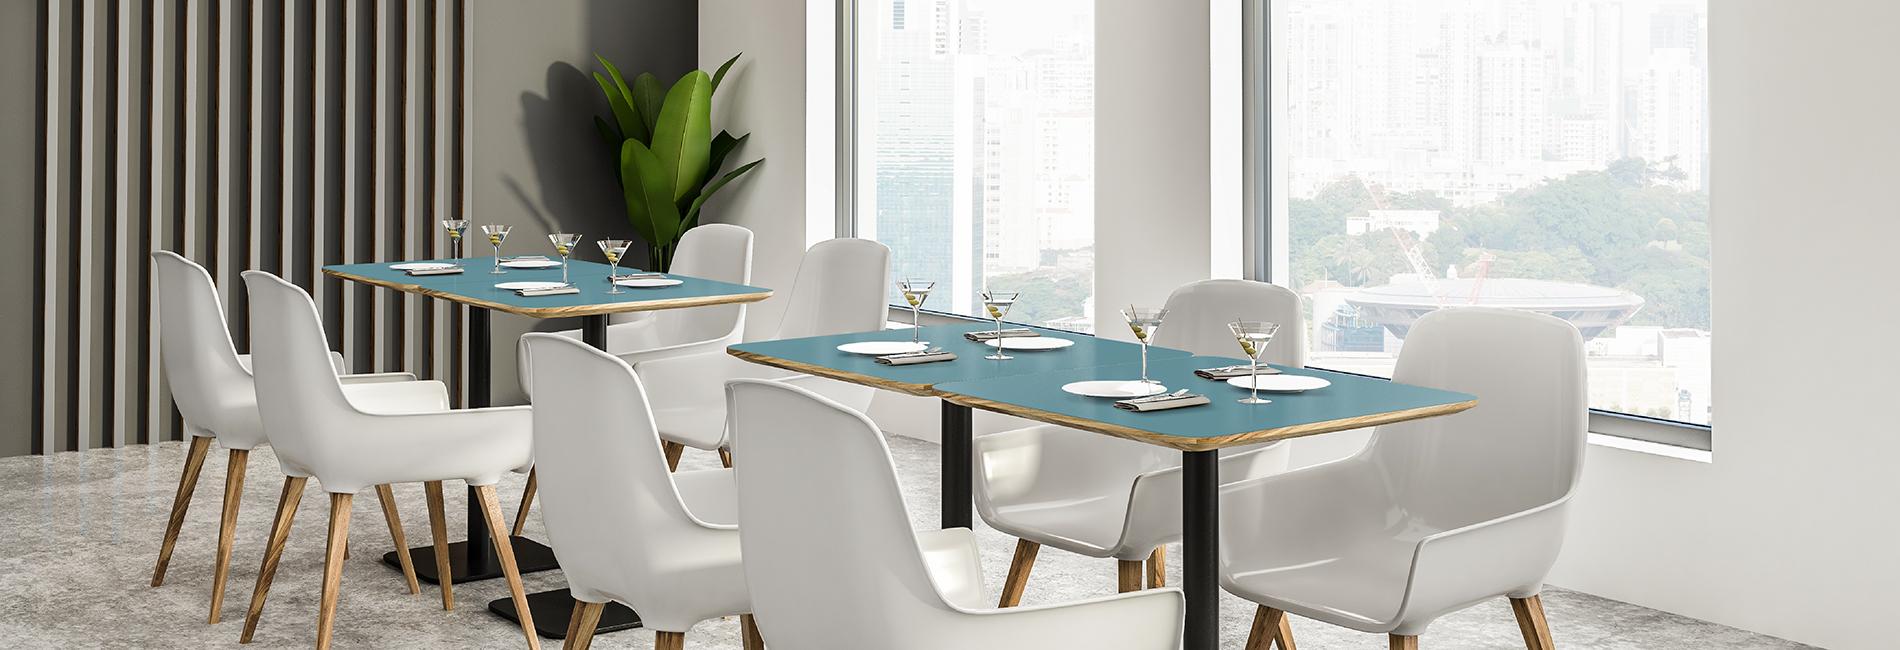 Restaurant Roomset F7846 Grotto 1900x650